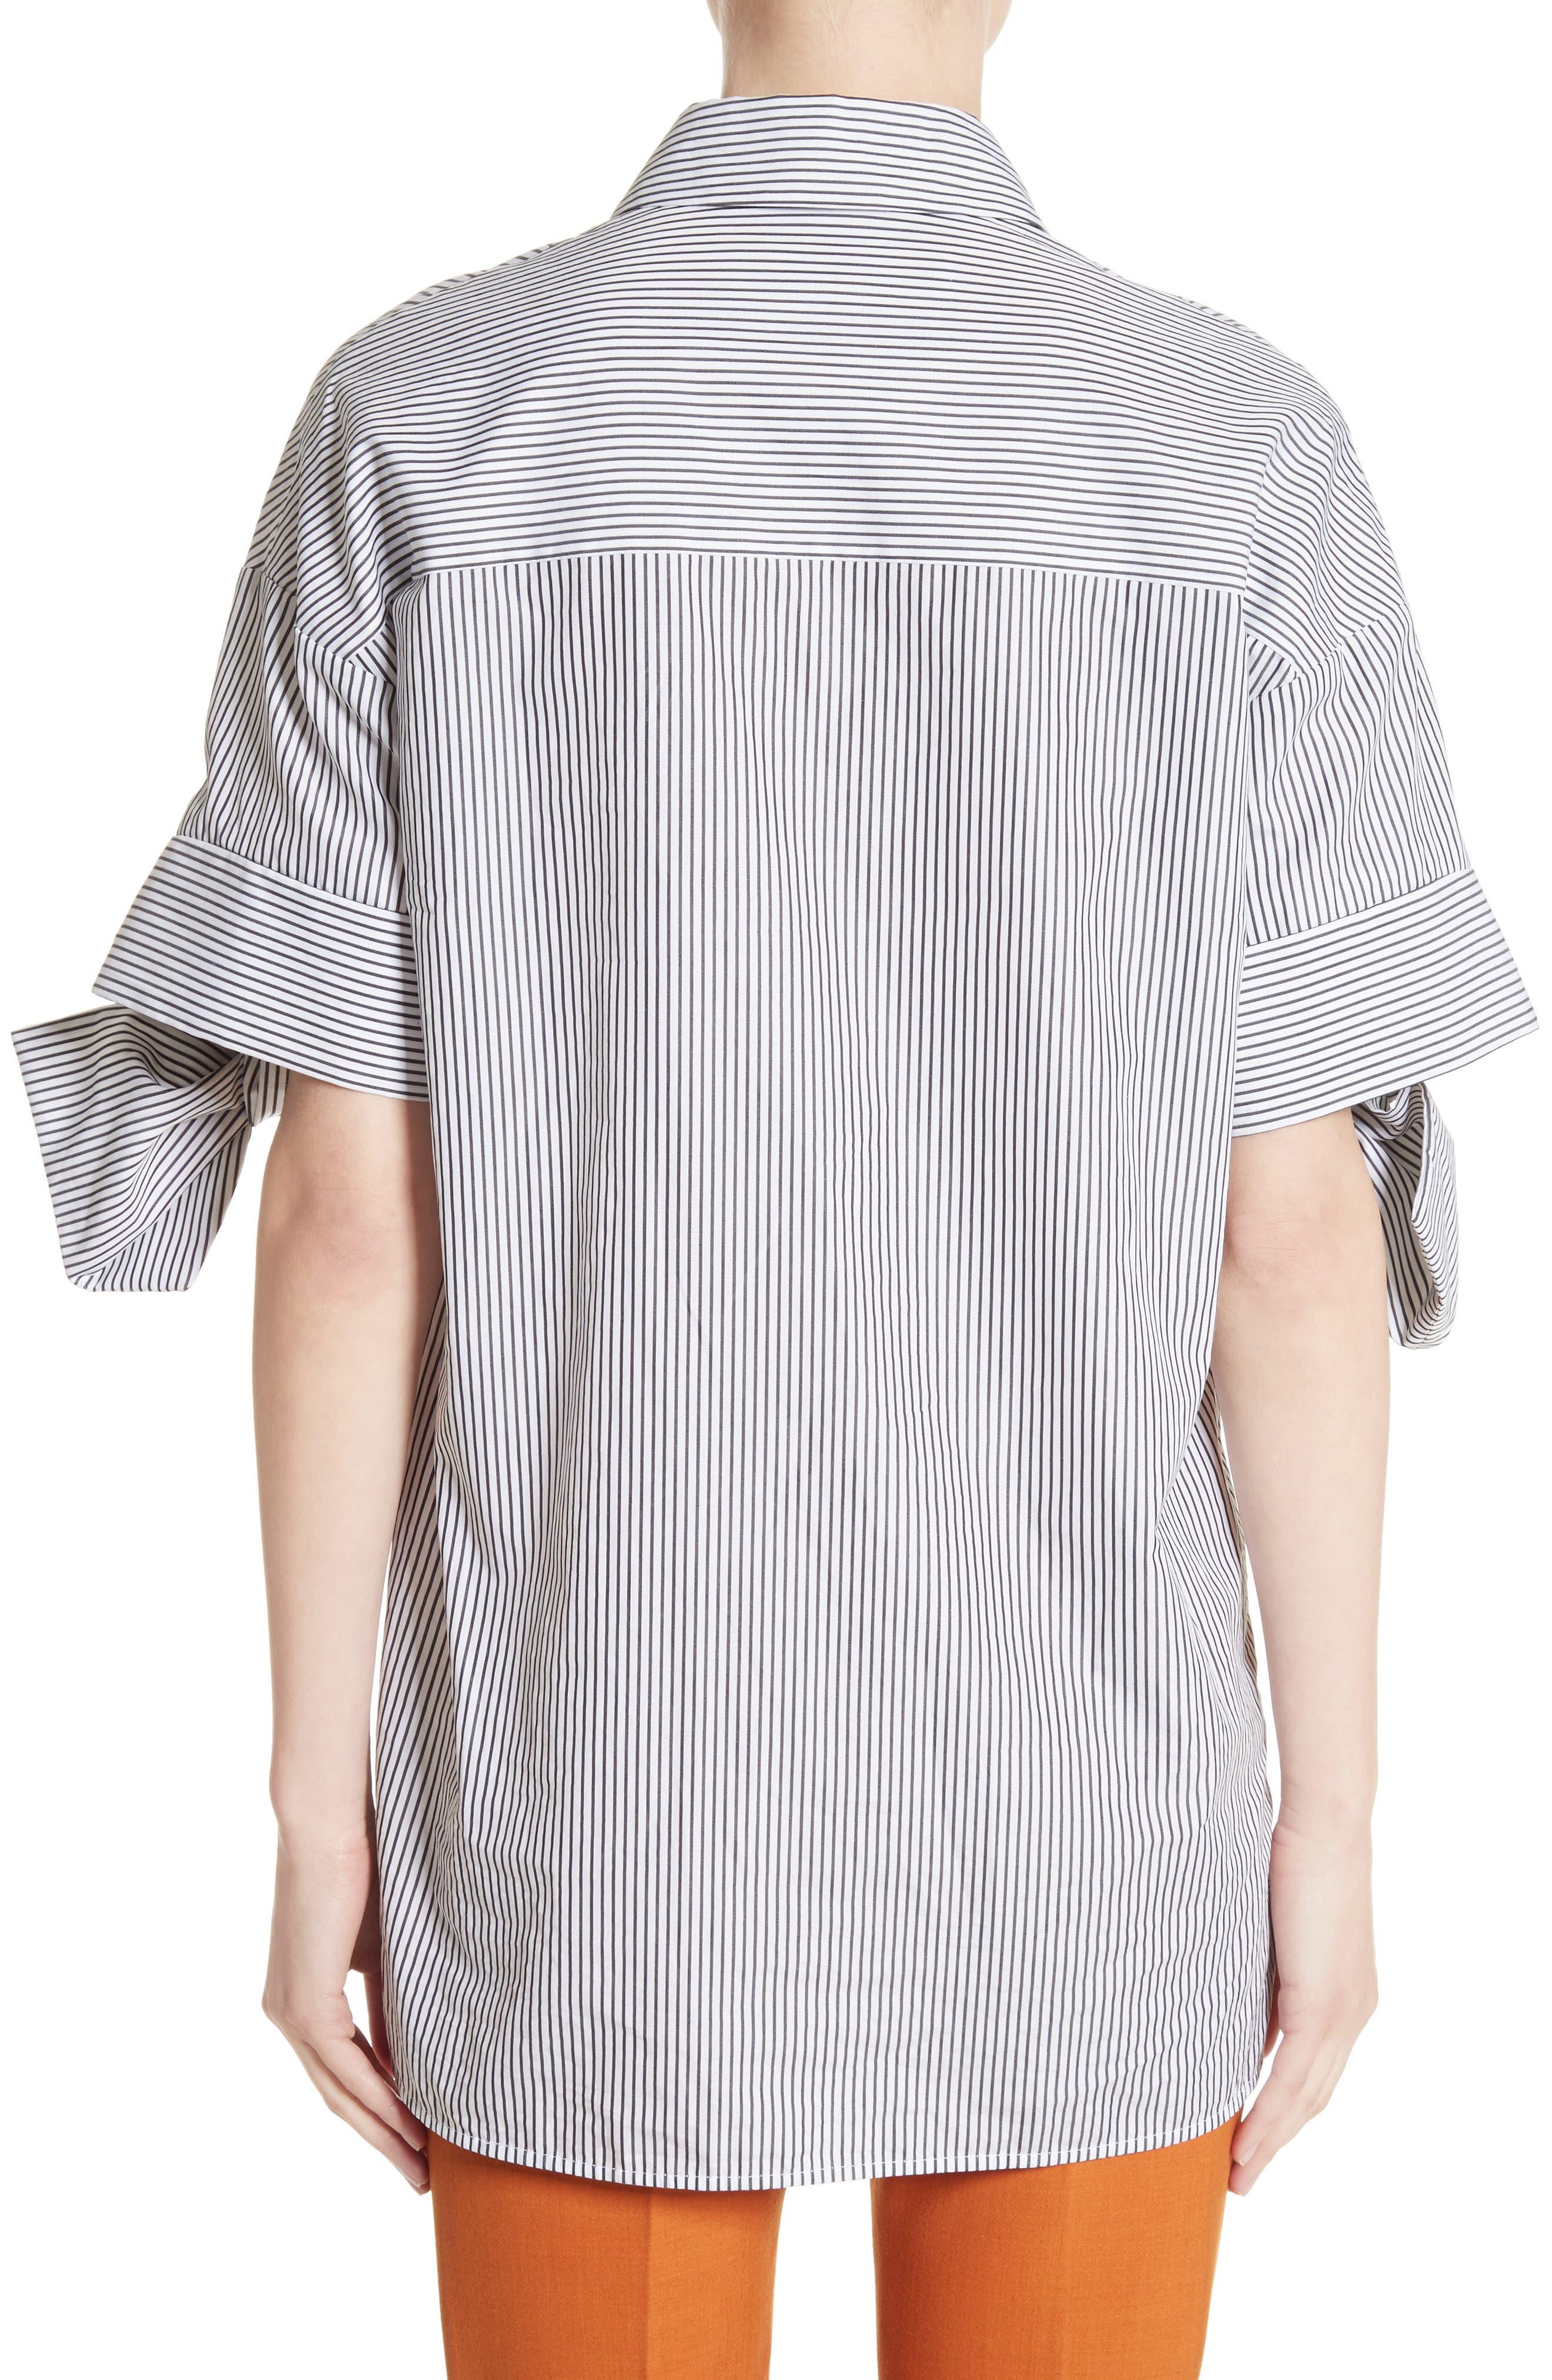 Bow Sleeve Shirt,                             Alternate thumbnail 2, color,                             Black/ White